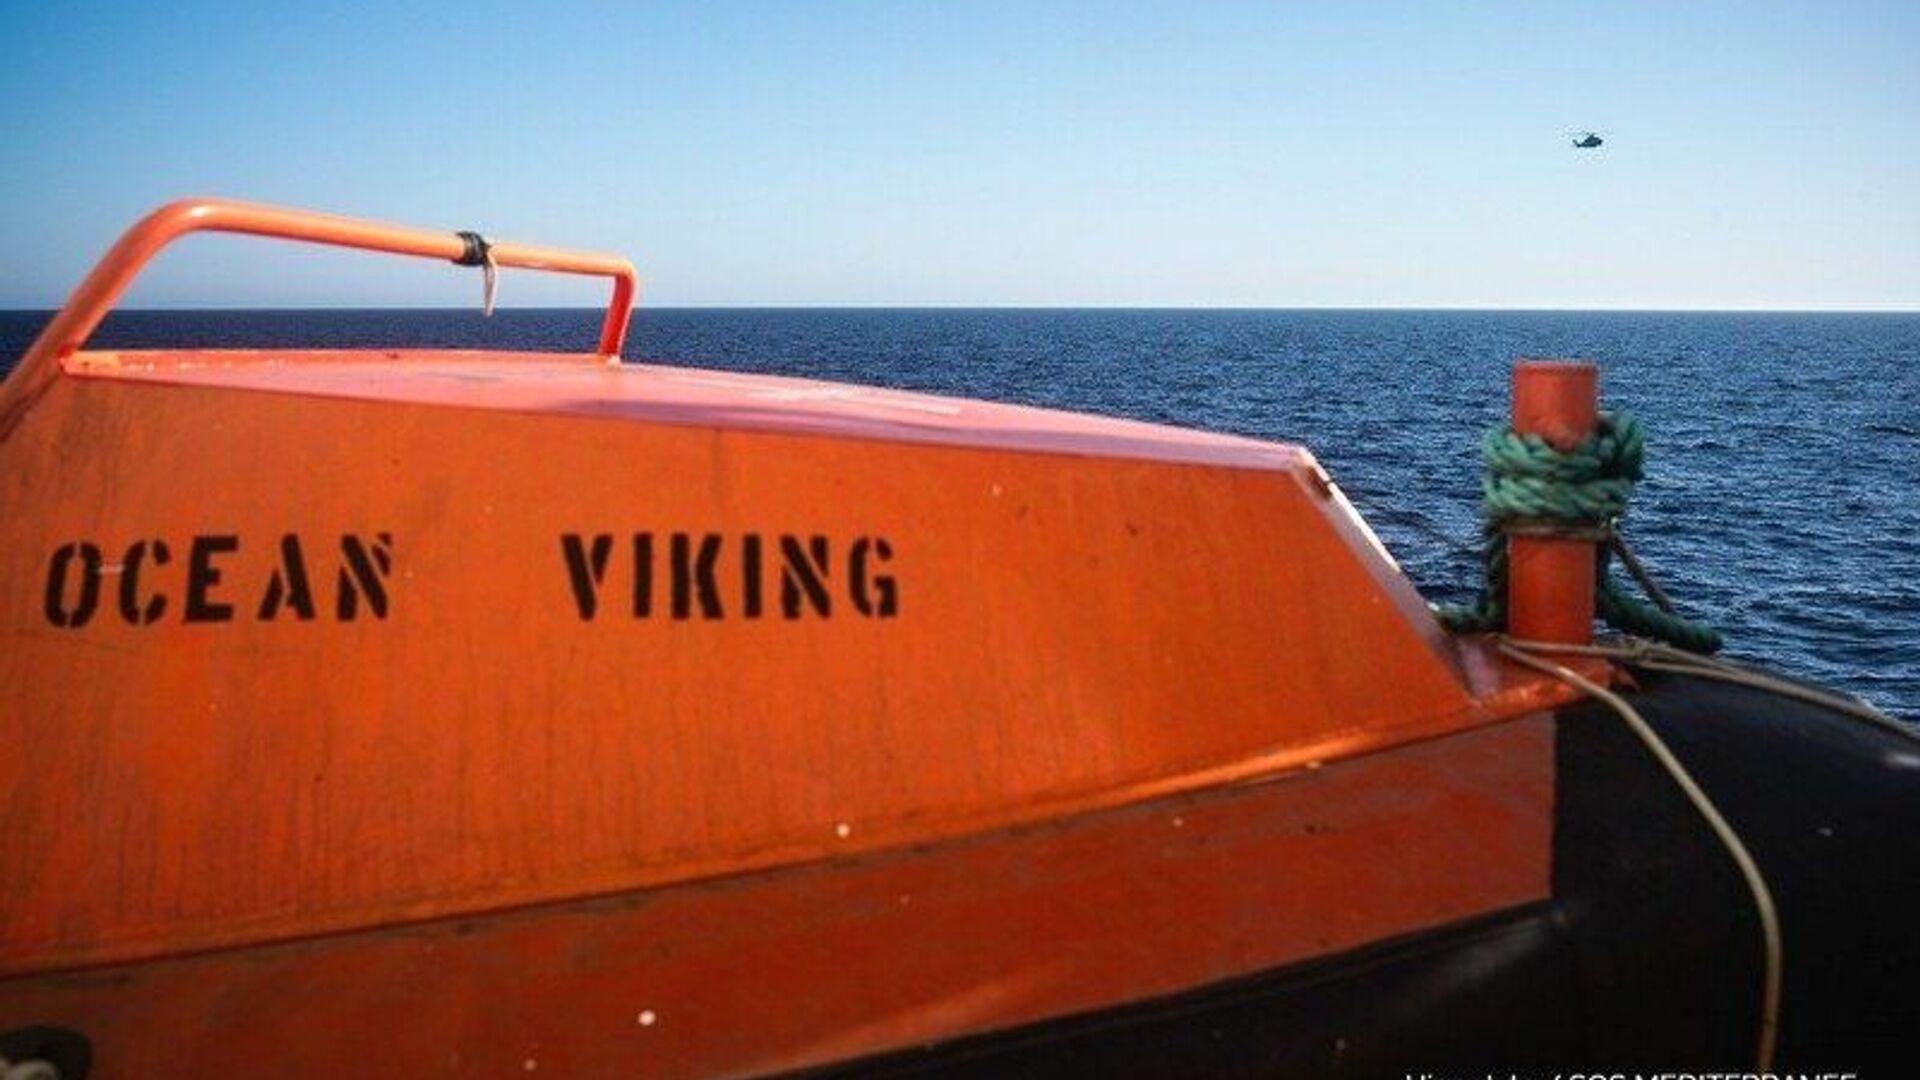 Nave Ocean Viking / Sos Mediterranée - Sputnik Italia, 1920, 31.07.2021